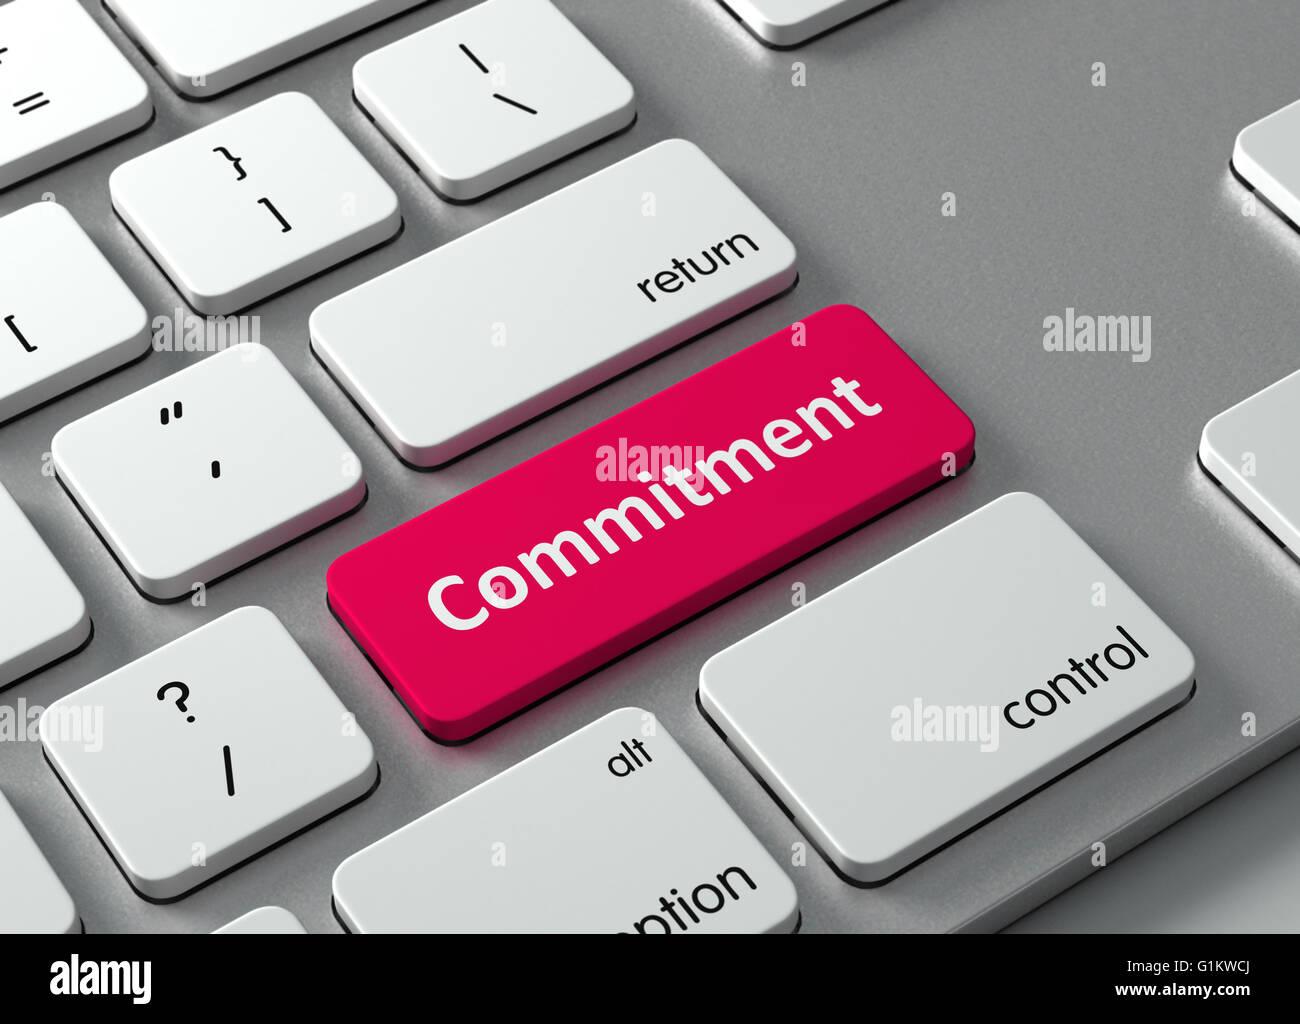 Un teclado con un botón rojo compromiso Imagen De Stock